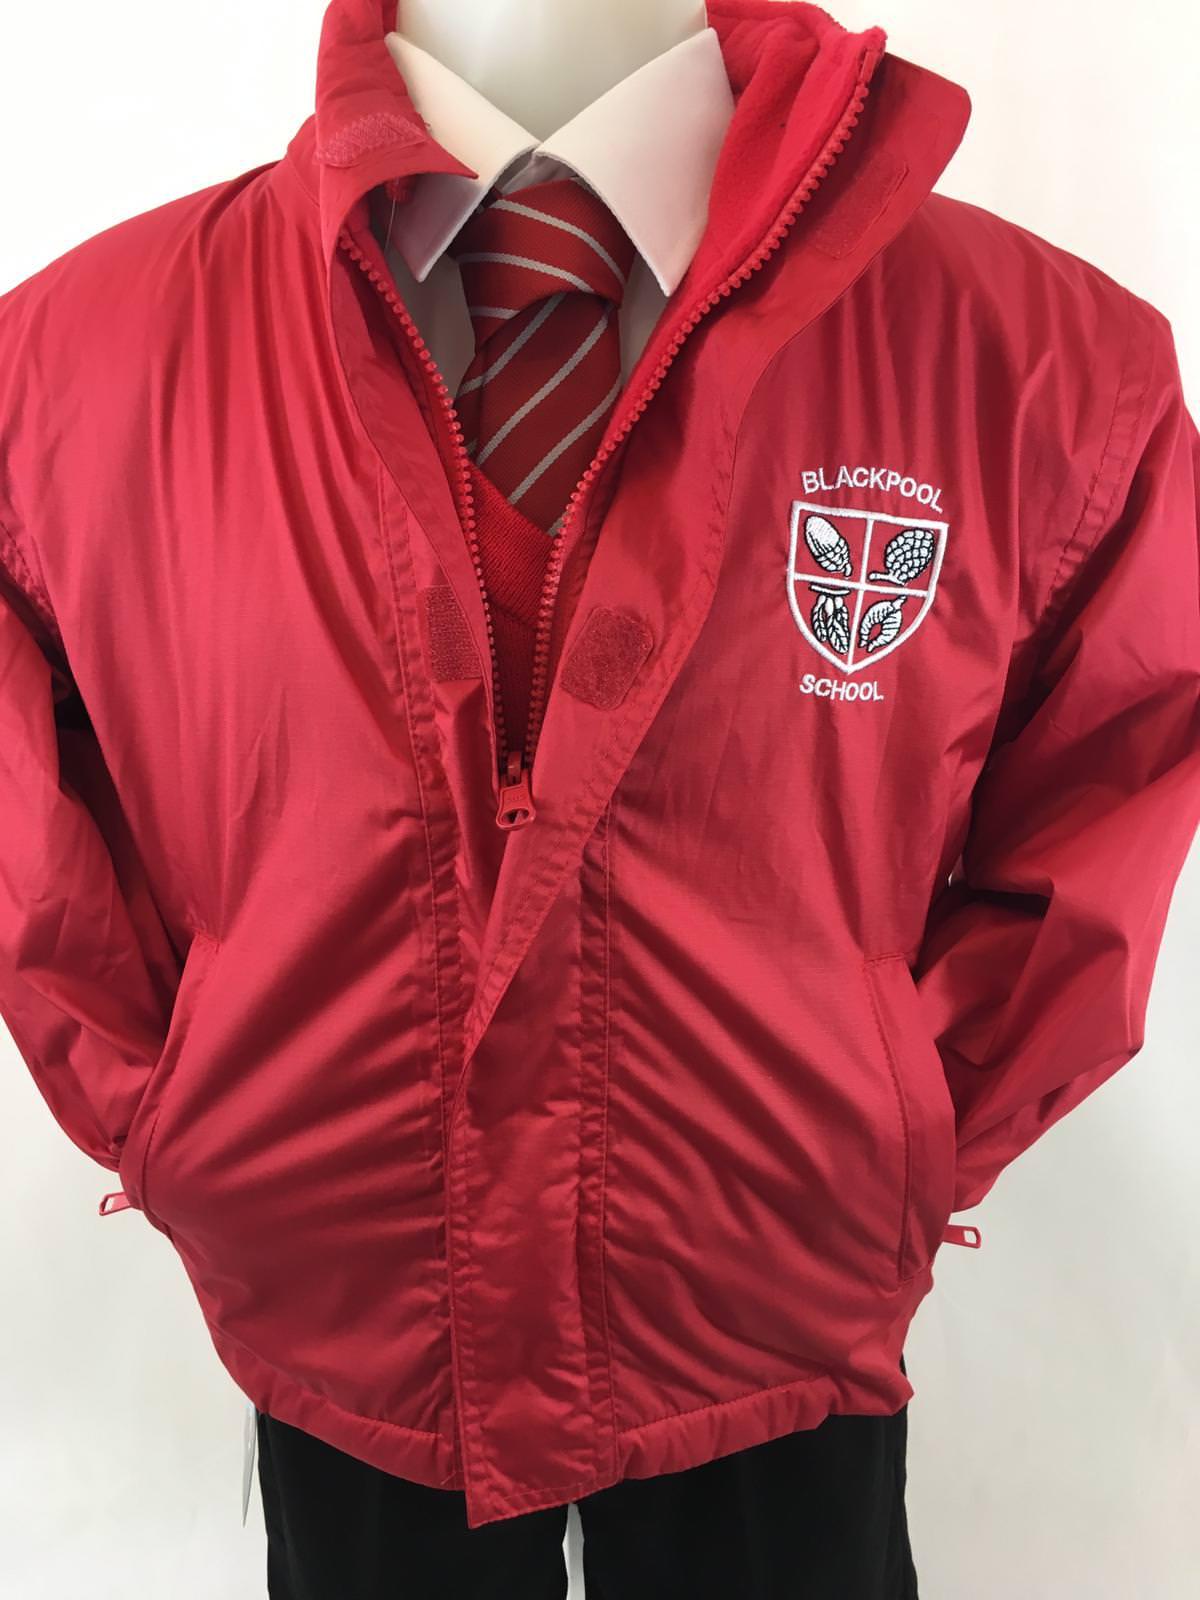 5a3168619 Blackpool Primary School Reversible Coat